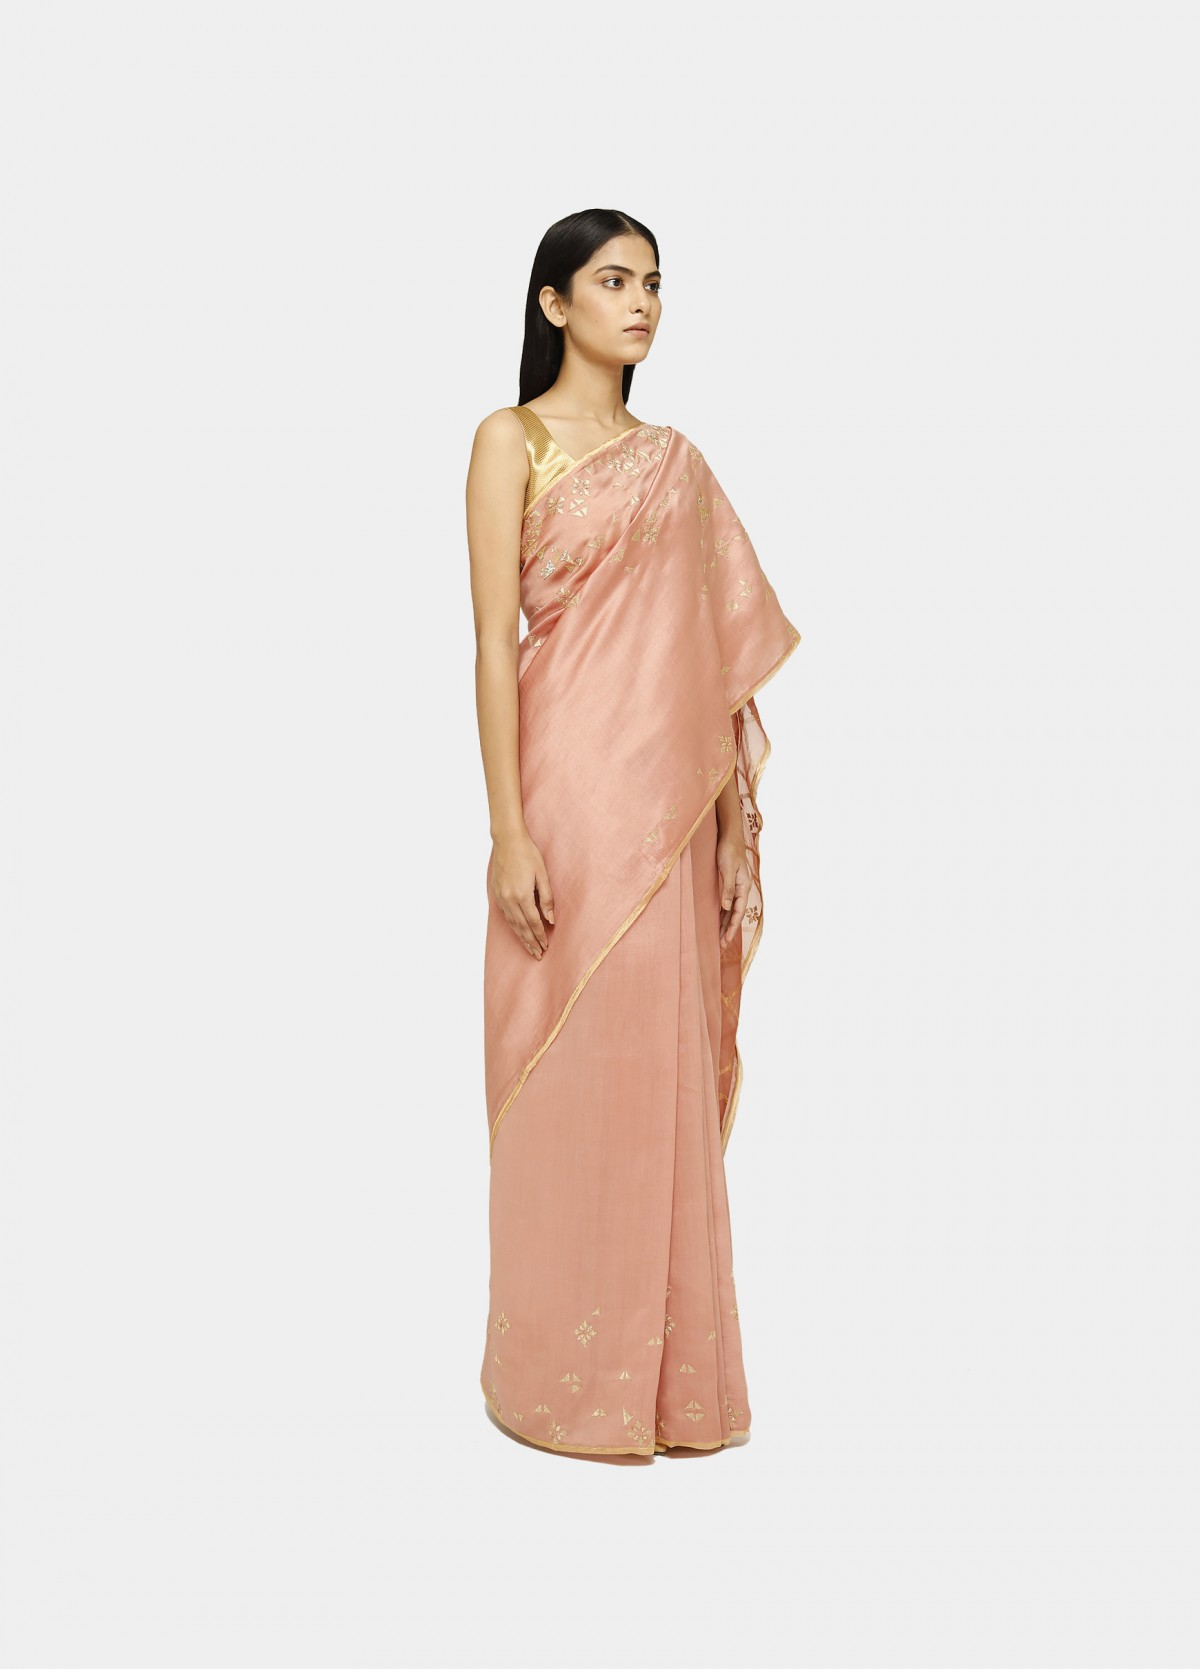 The Devia Sari